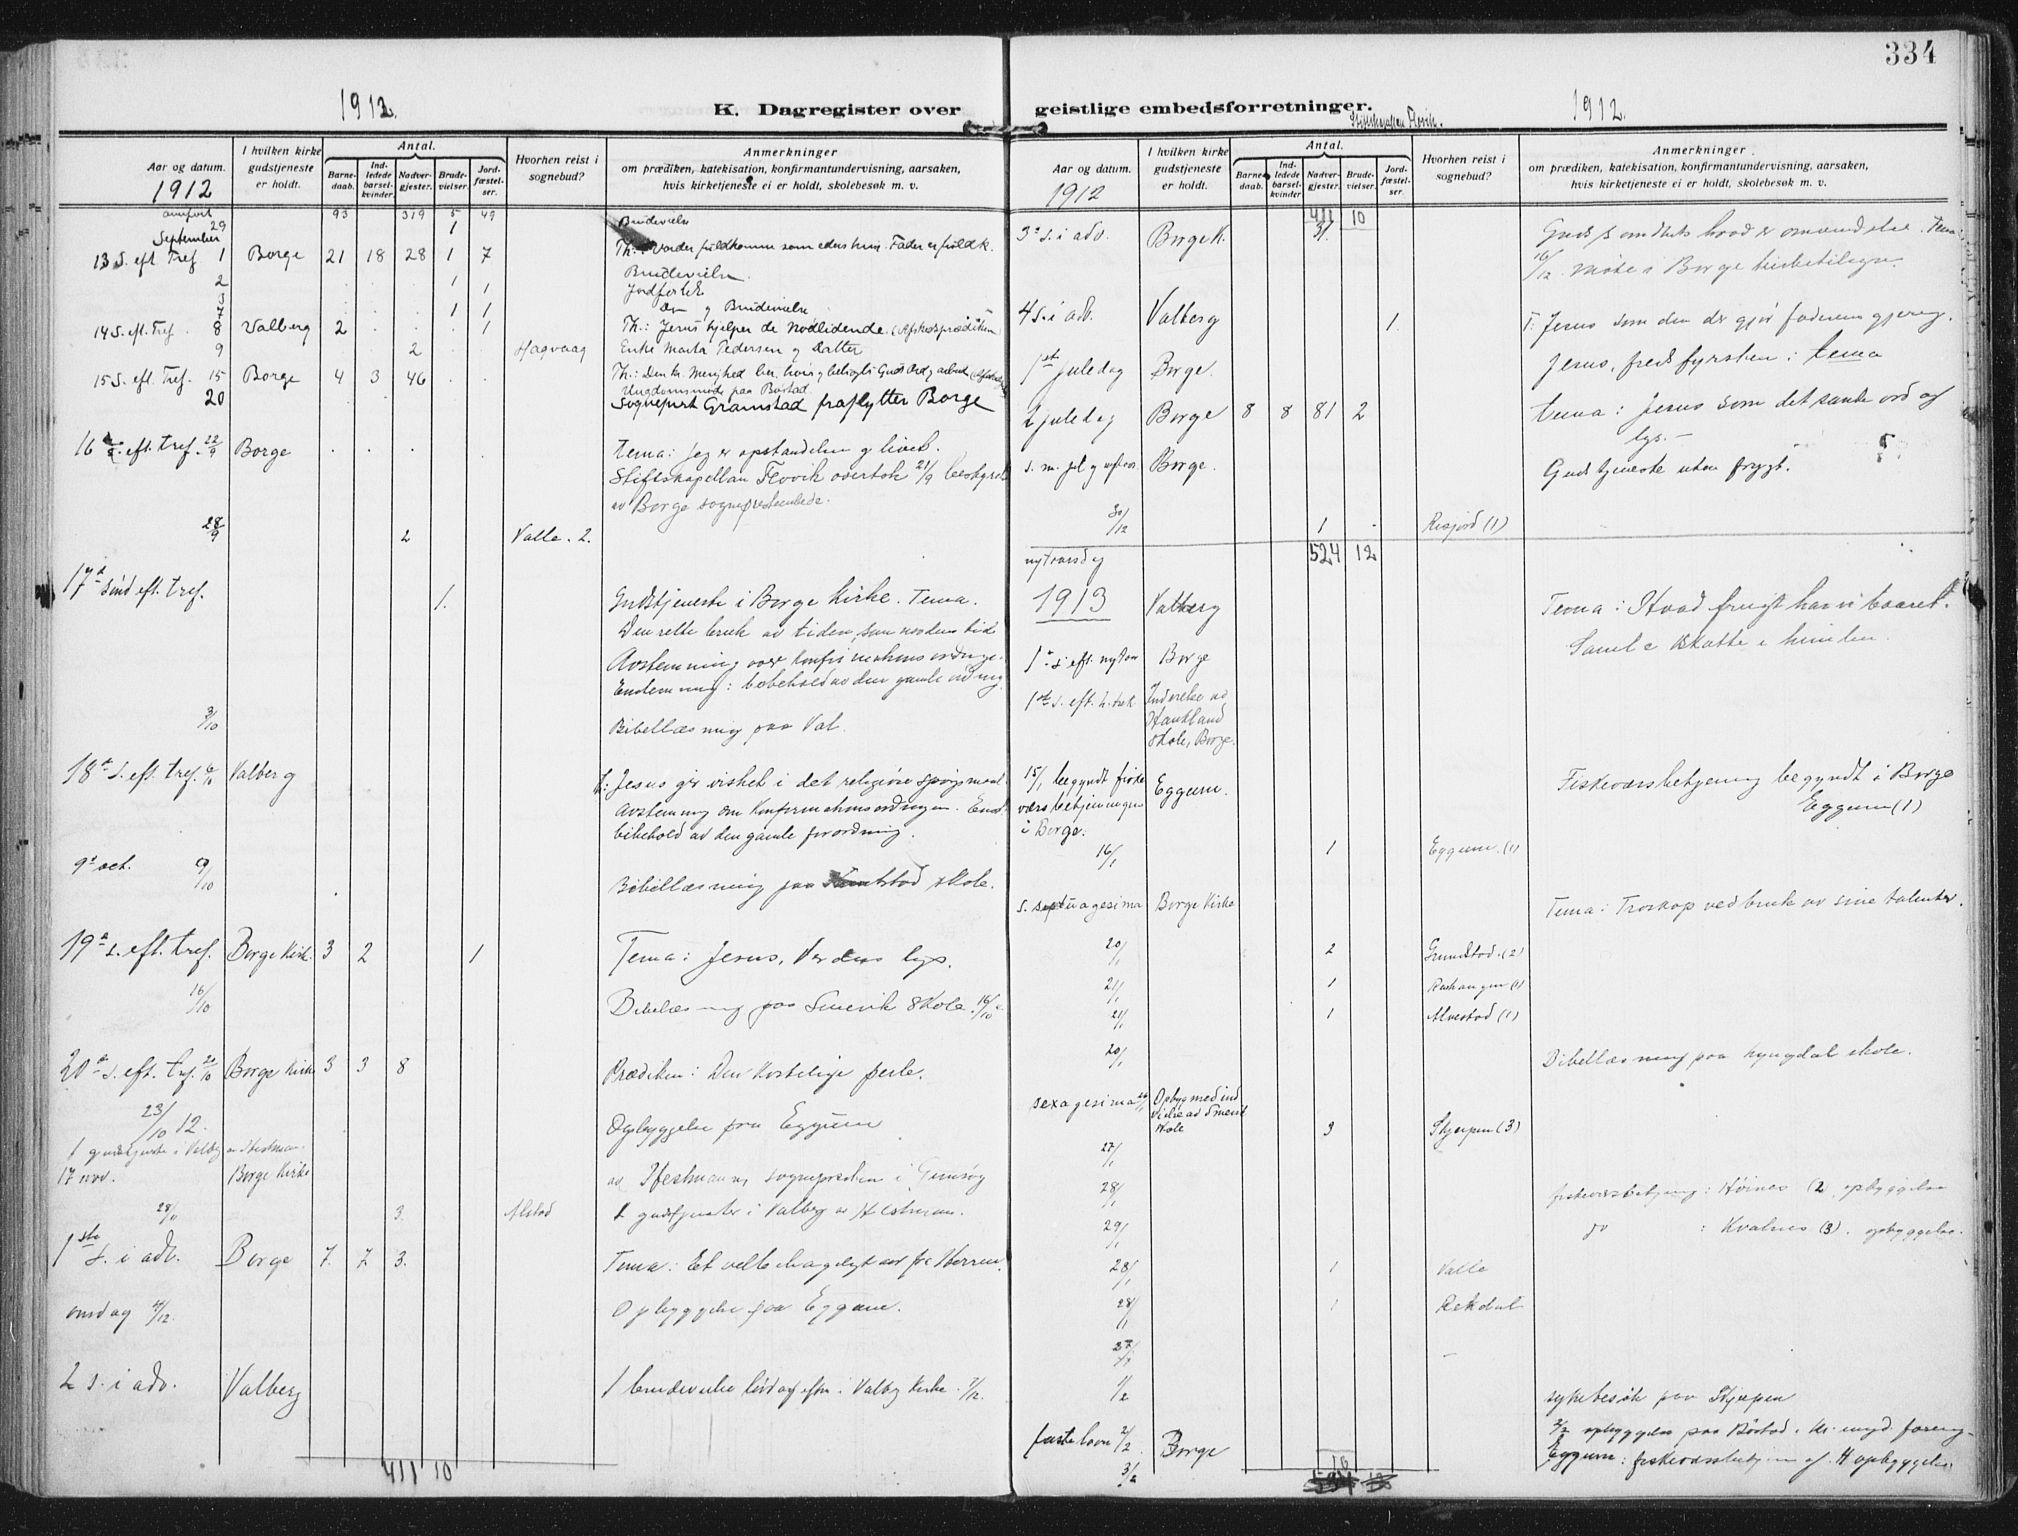 SAT, Ministerialprotokoller, klokkerbøker og fødselsregistre - Nordland, 880/L1135: Ministerialbok nr. 880A09, 1908-1919, s. 334